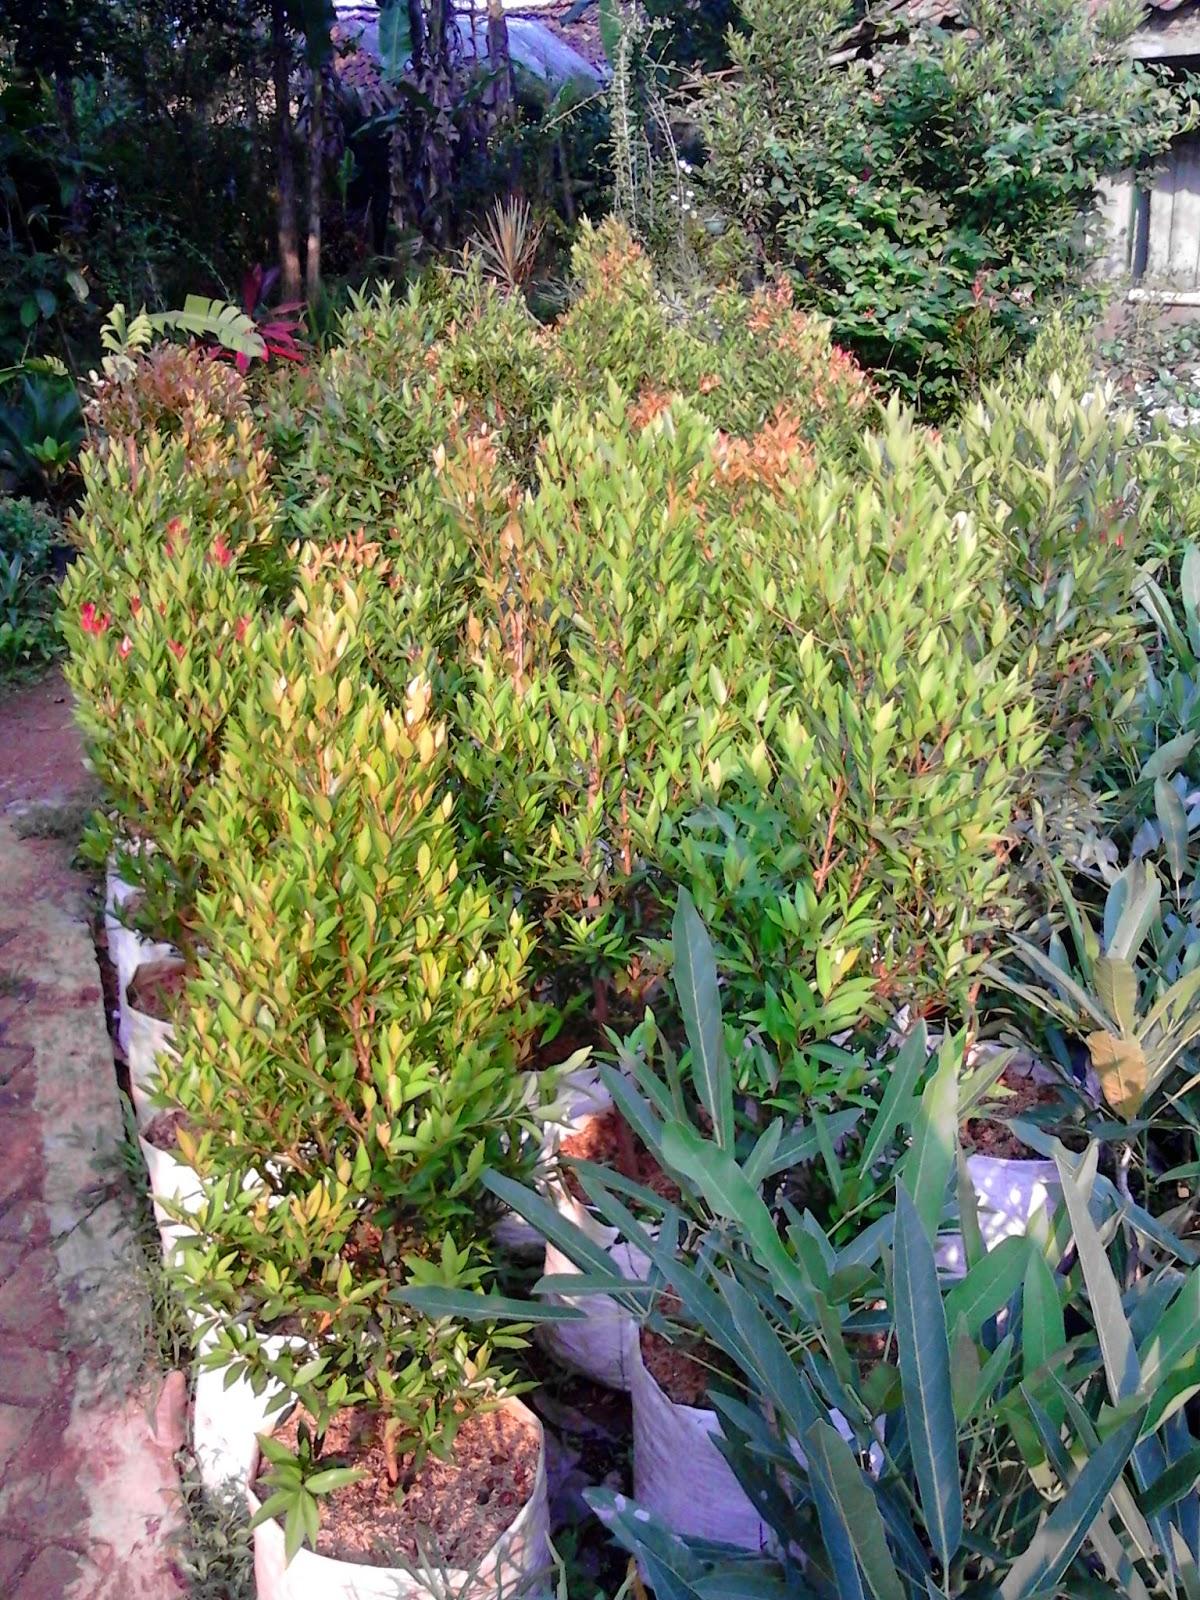 Jual Pohon Pucuk Merah Murah | Tanaman Pucuk Mreah | Jual Tanaman Hias Online